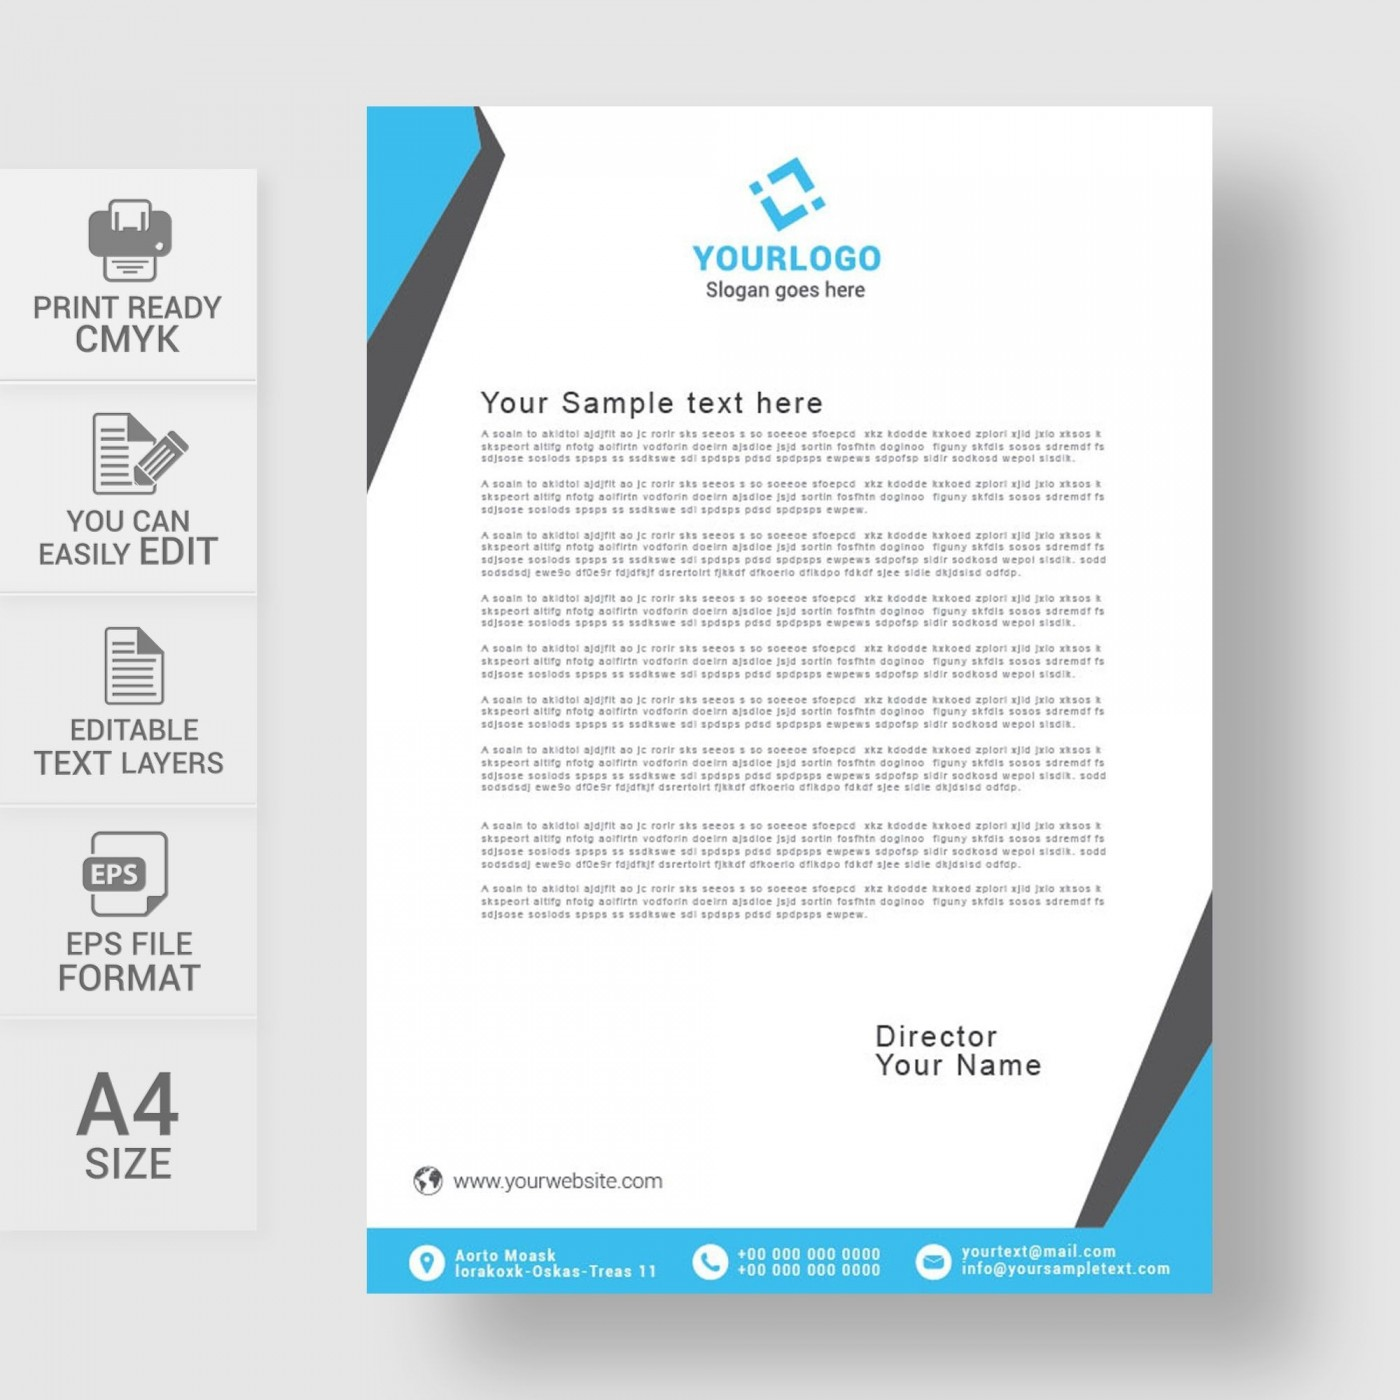 002 Unbelievable Letterhead Sample Free Download High Resolution  Template Ai Microsoft Word Restaurant1400